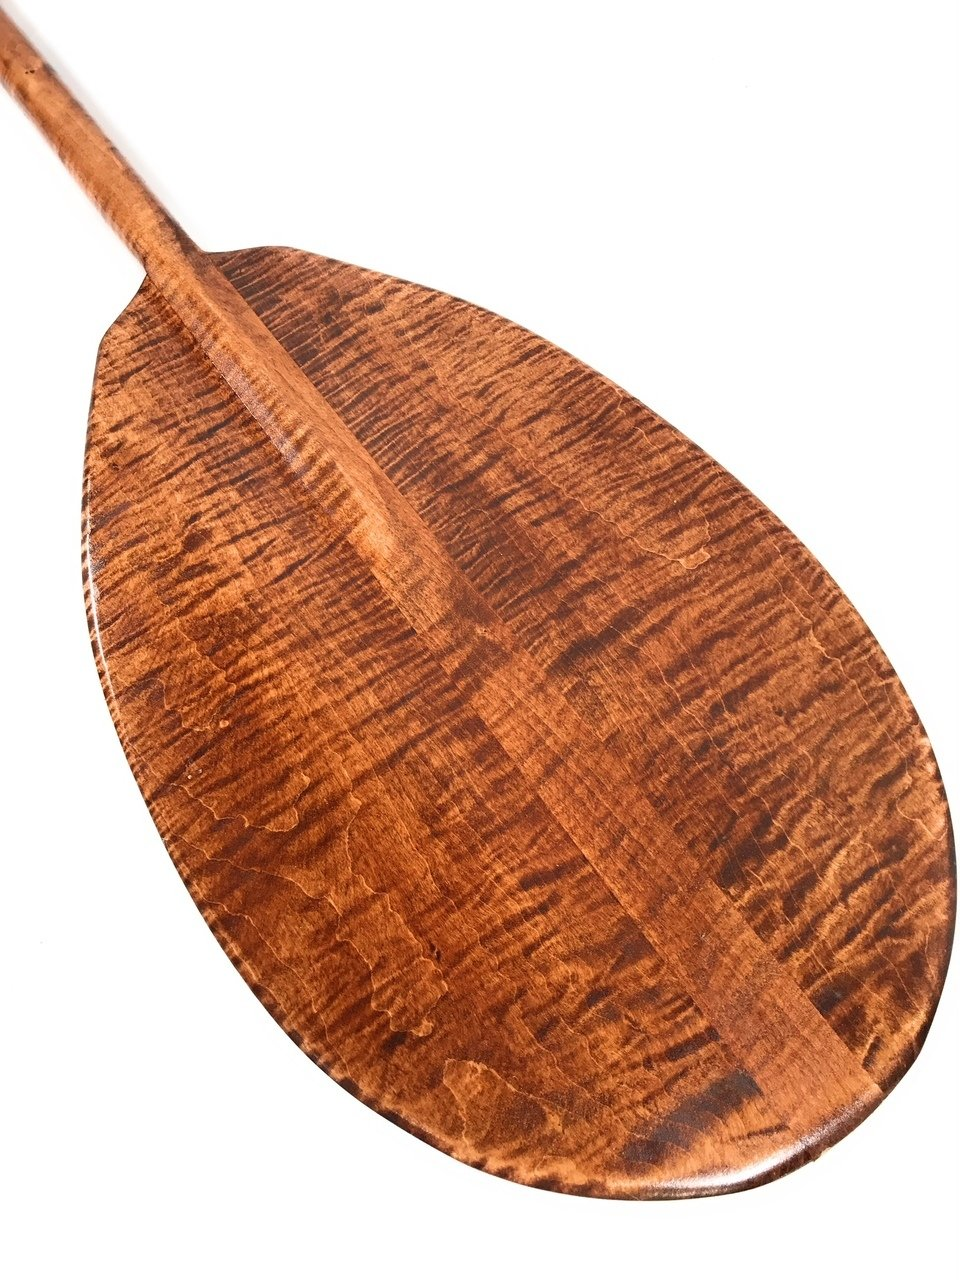 Decorative Hawaiian Outrigger Paddle 50'' w/ T Handle - Maple | #koa6081